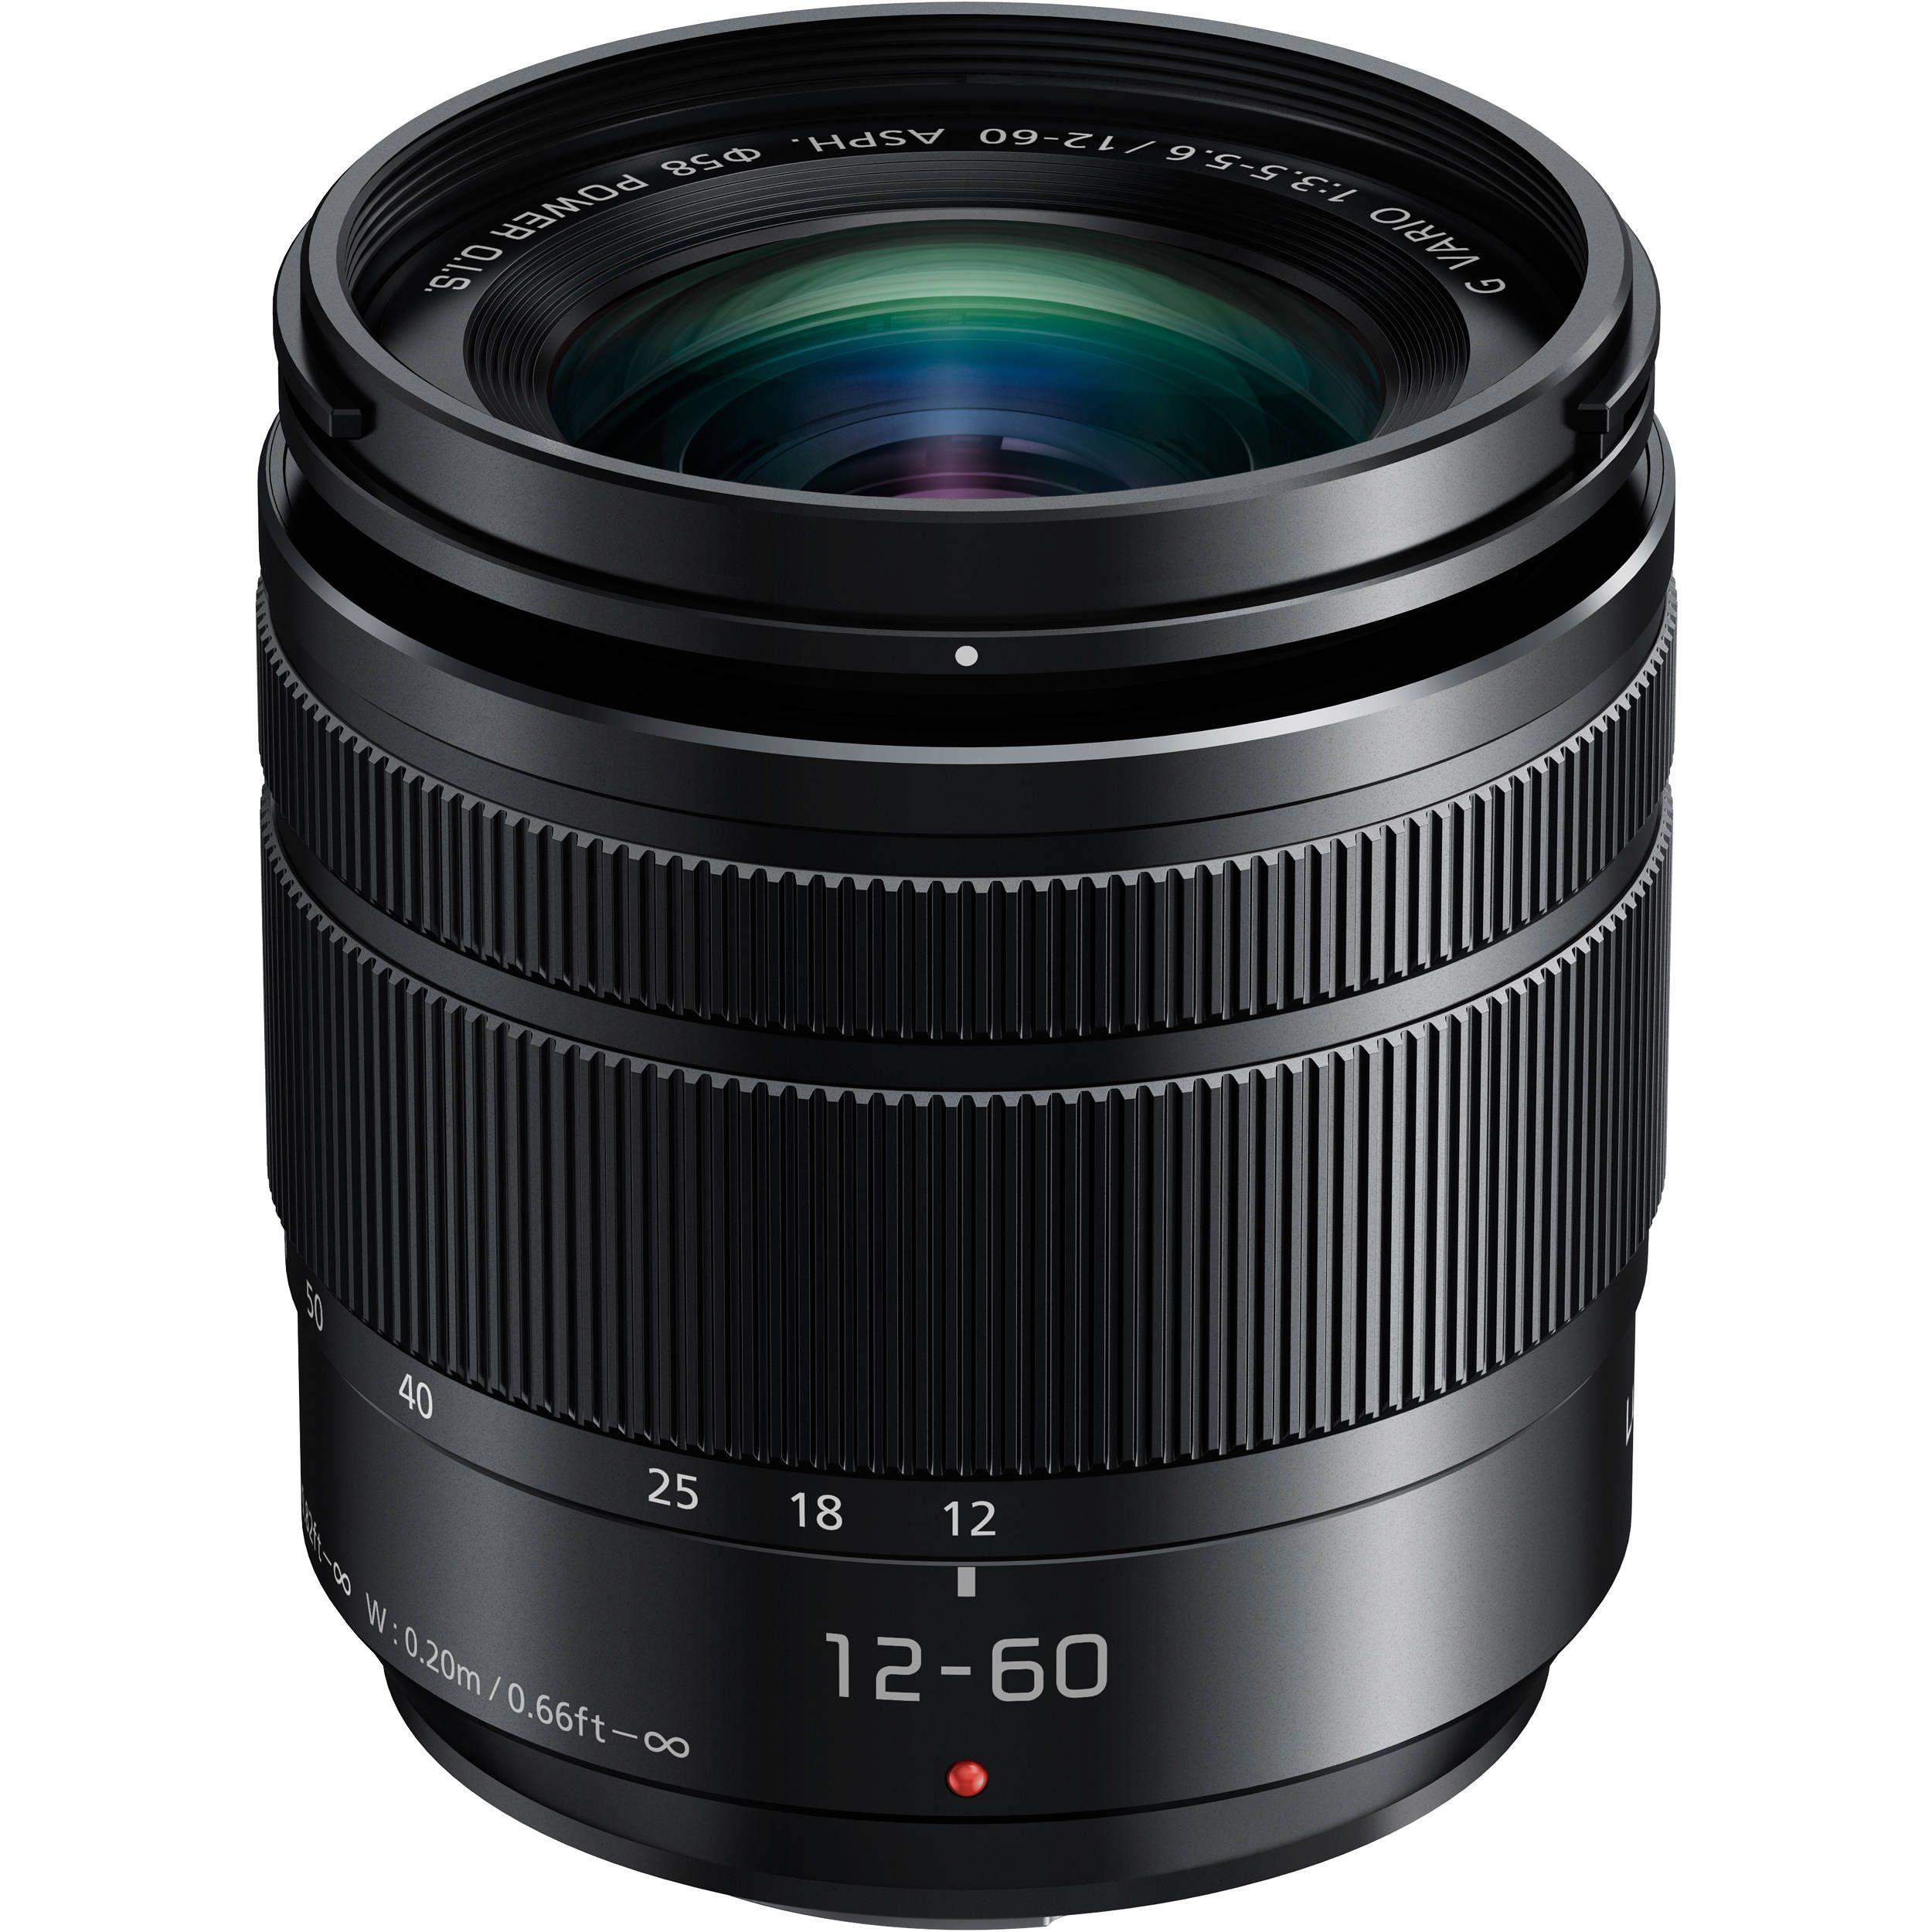 Panasonic Lumix G Vario 12 60mm F 3 5 5 6 Asph Power O I S Lens Panasonic Lumix Lens Mirrorless Camera